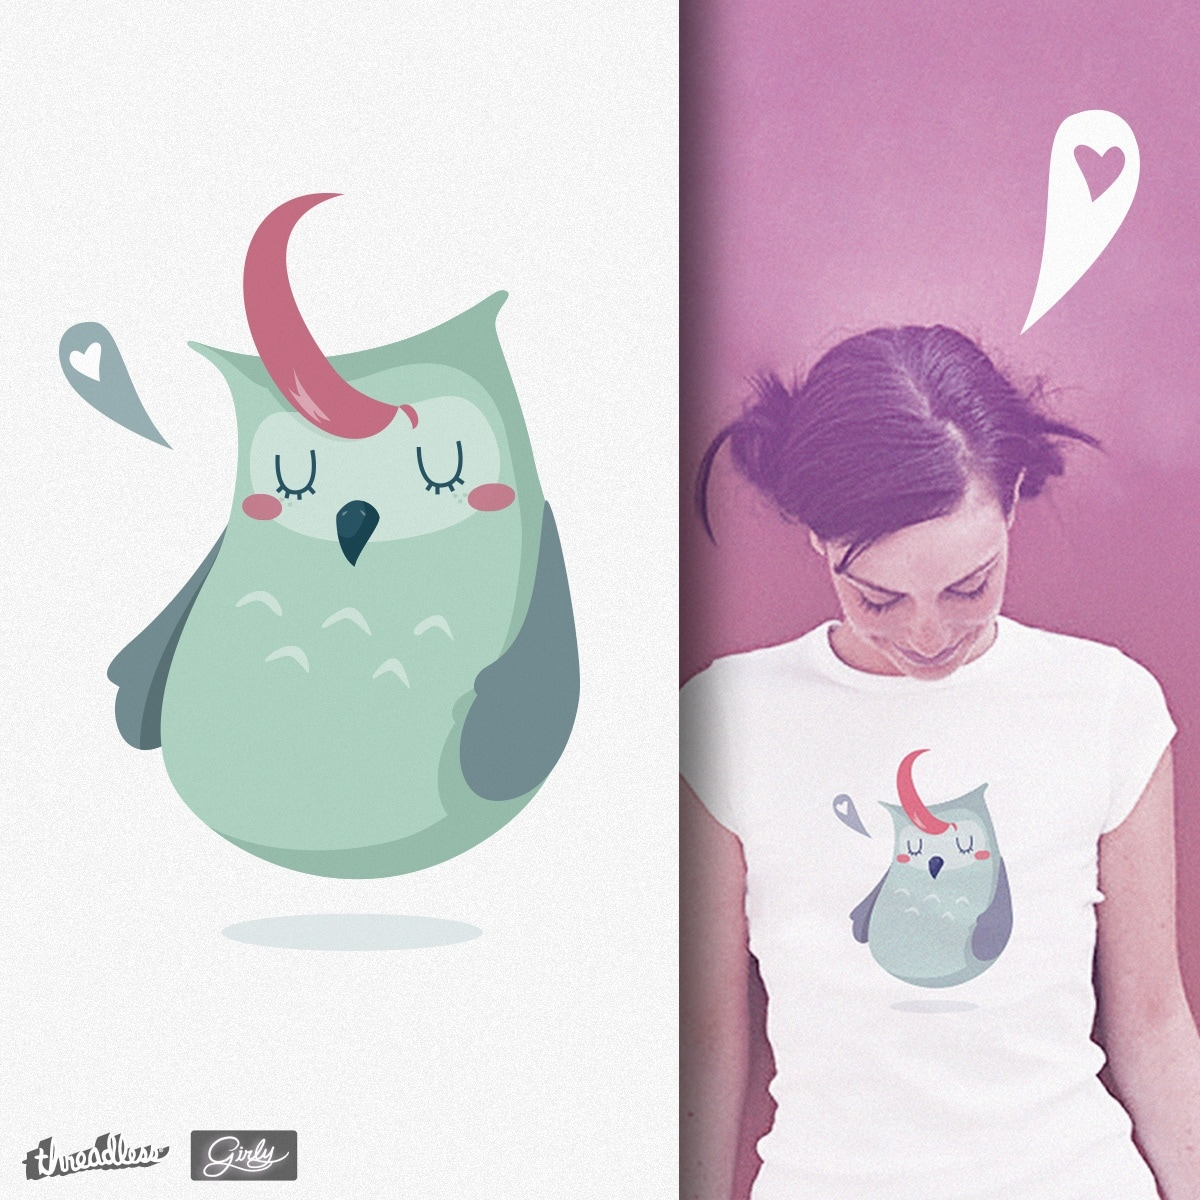 Owl in love by chiara_zava on Threadless